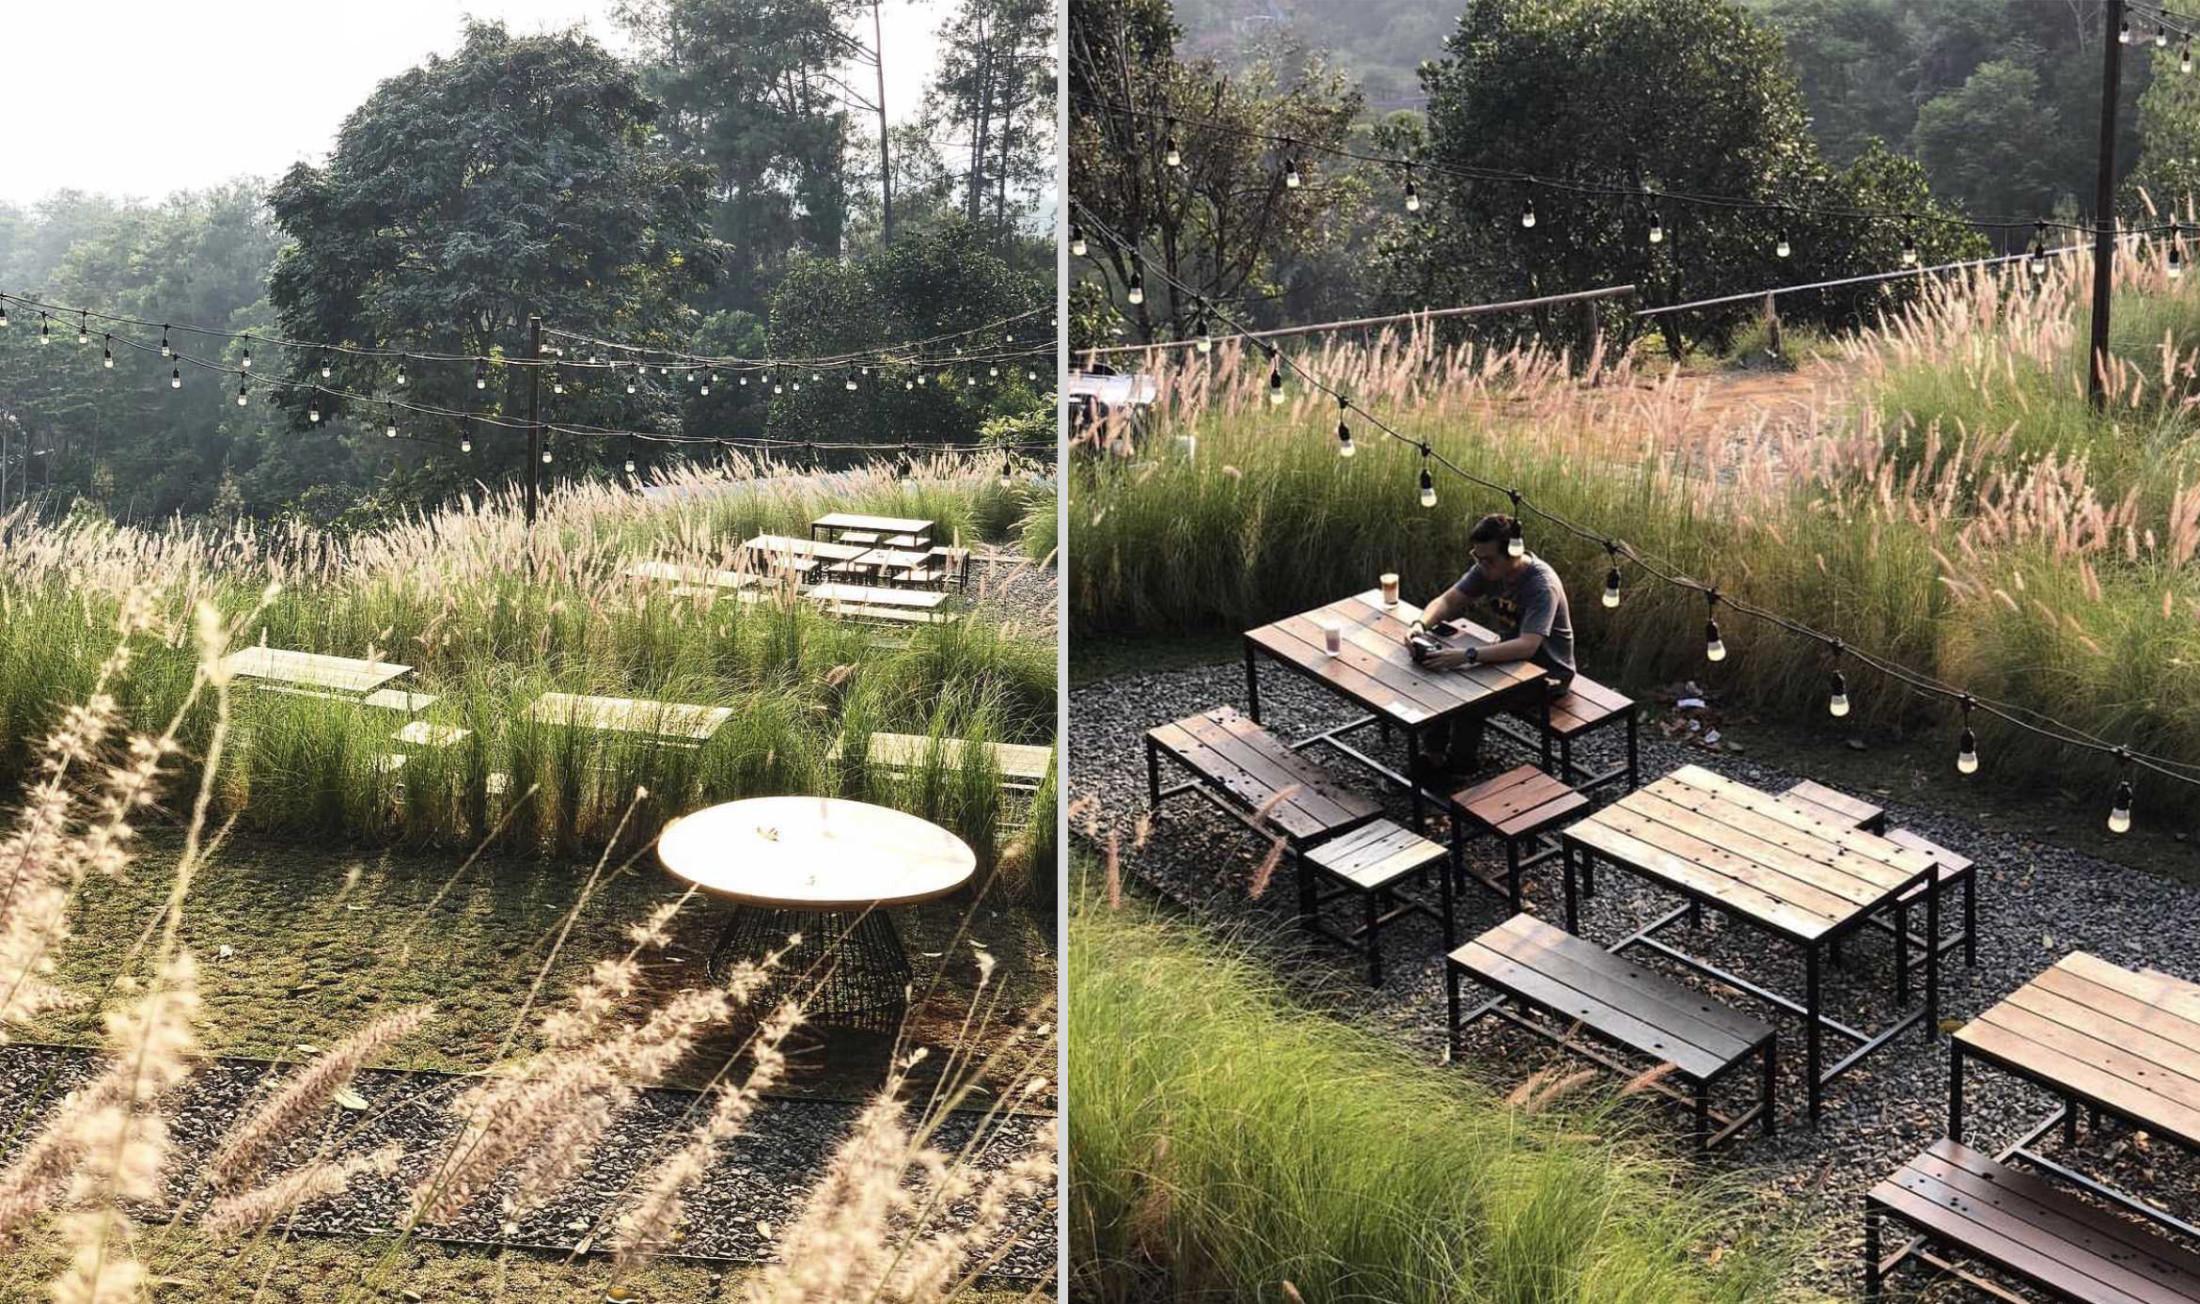 Kafe dengan keindahan ilalang, Utara Café Karya Wandi Uwa Krisdian (Sumber: arsitag.com)